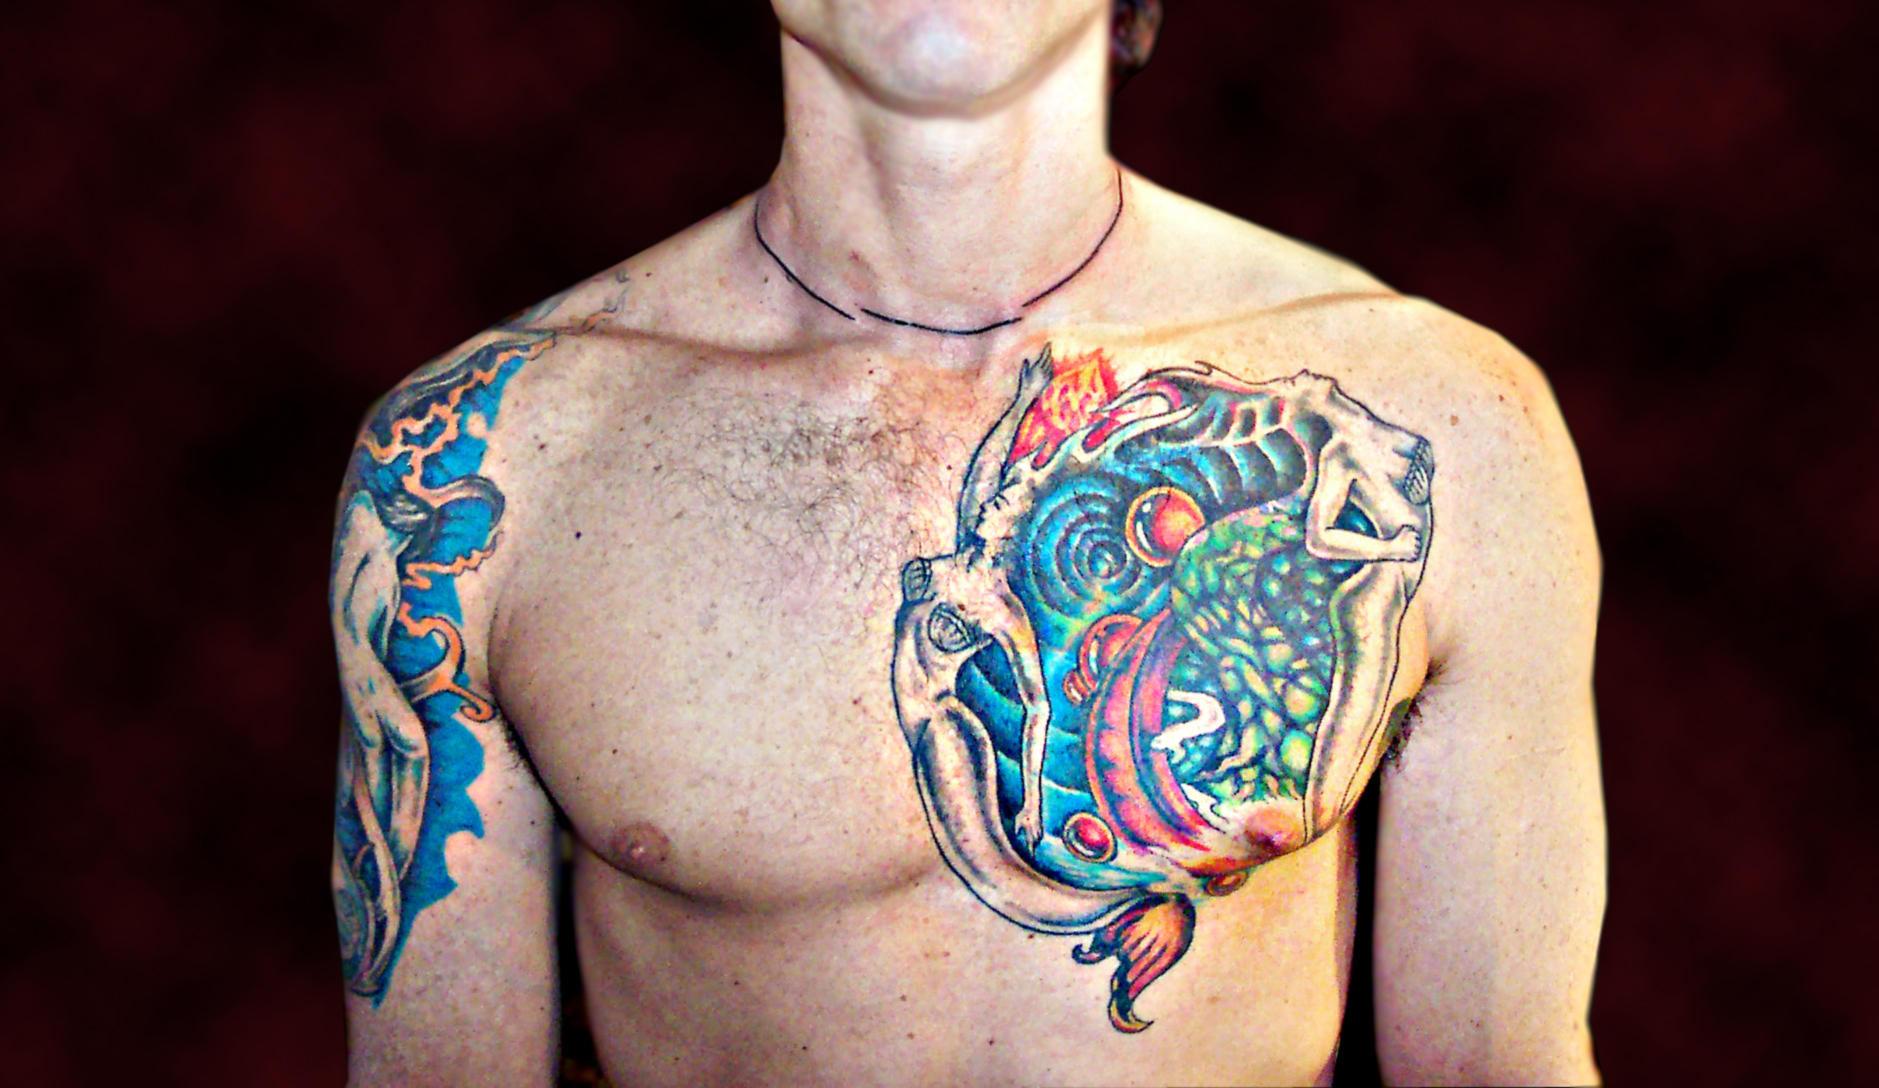 Chest Pieces Tattoo: Chest Piece Tattoo Cover Up By Liz1ttrstudio On DeviantArt